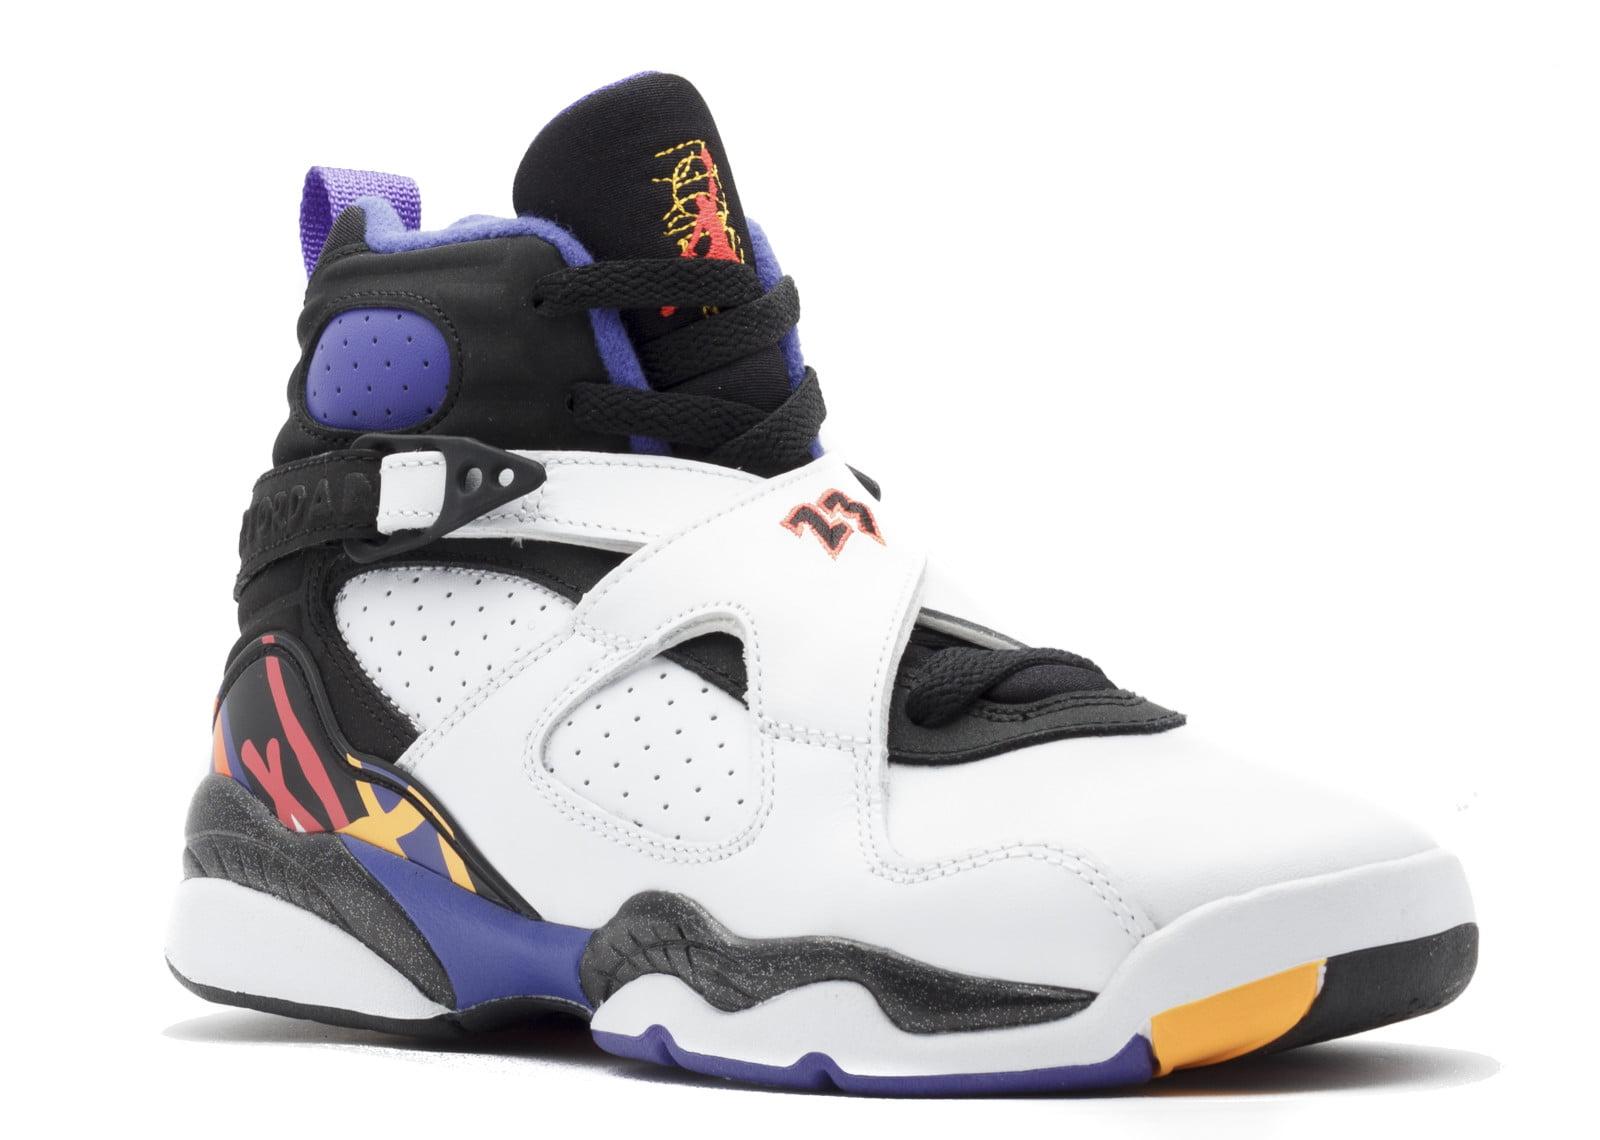 sneakers for cheap 04fc3 0b4c0 ... where to buy air jordan 8 retro bg gs three peat 305368 0728b 4afcc